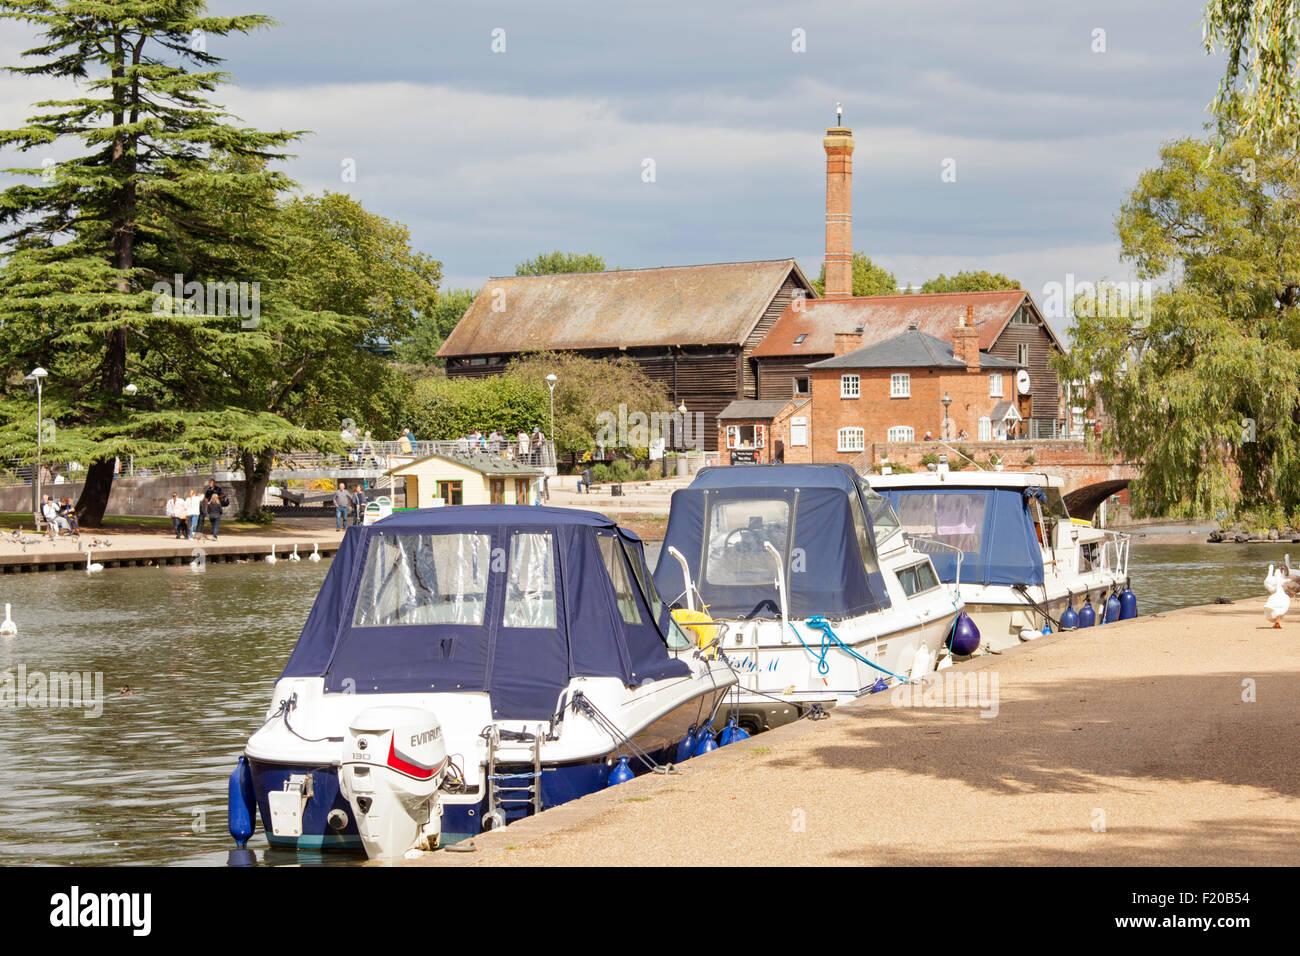 Cruisers moored on the River Avon, Stratford upon Avon, Warwickshire, England, UK - Stock Image